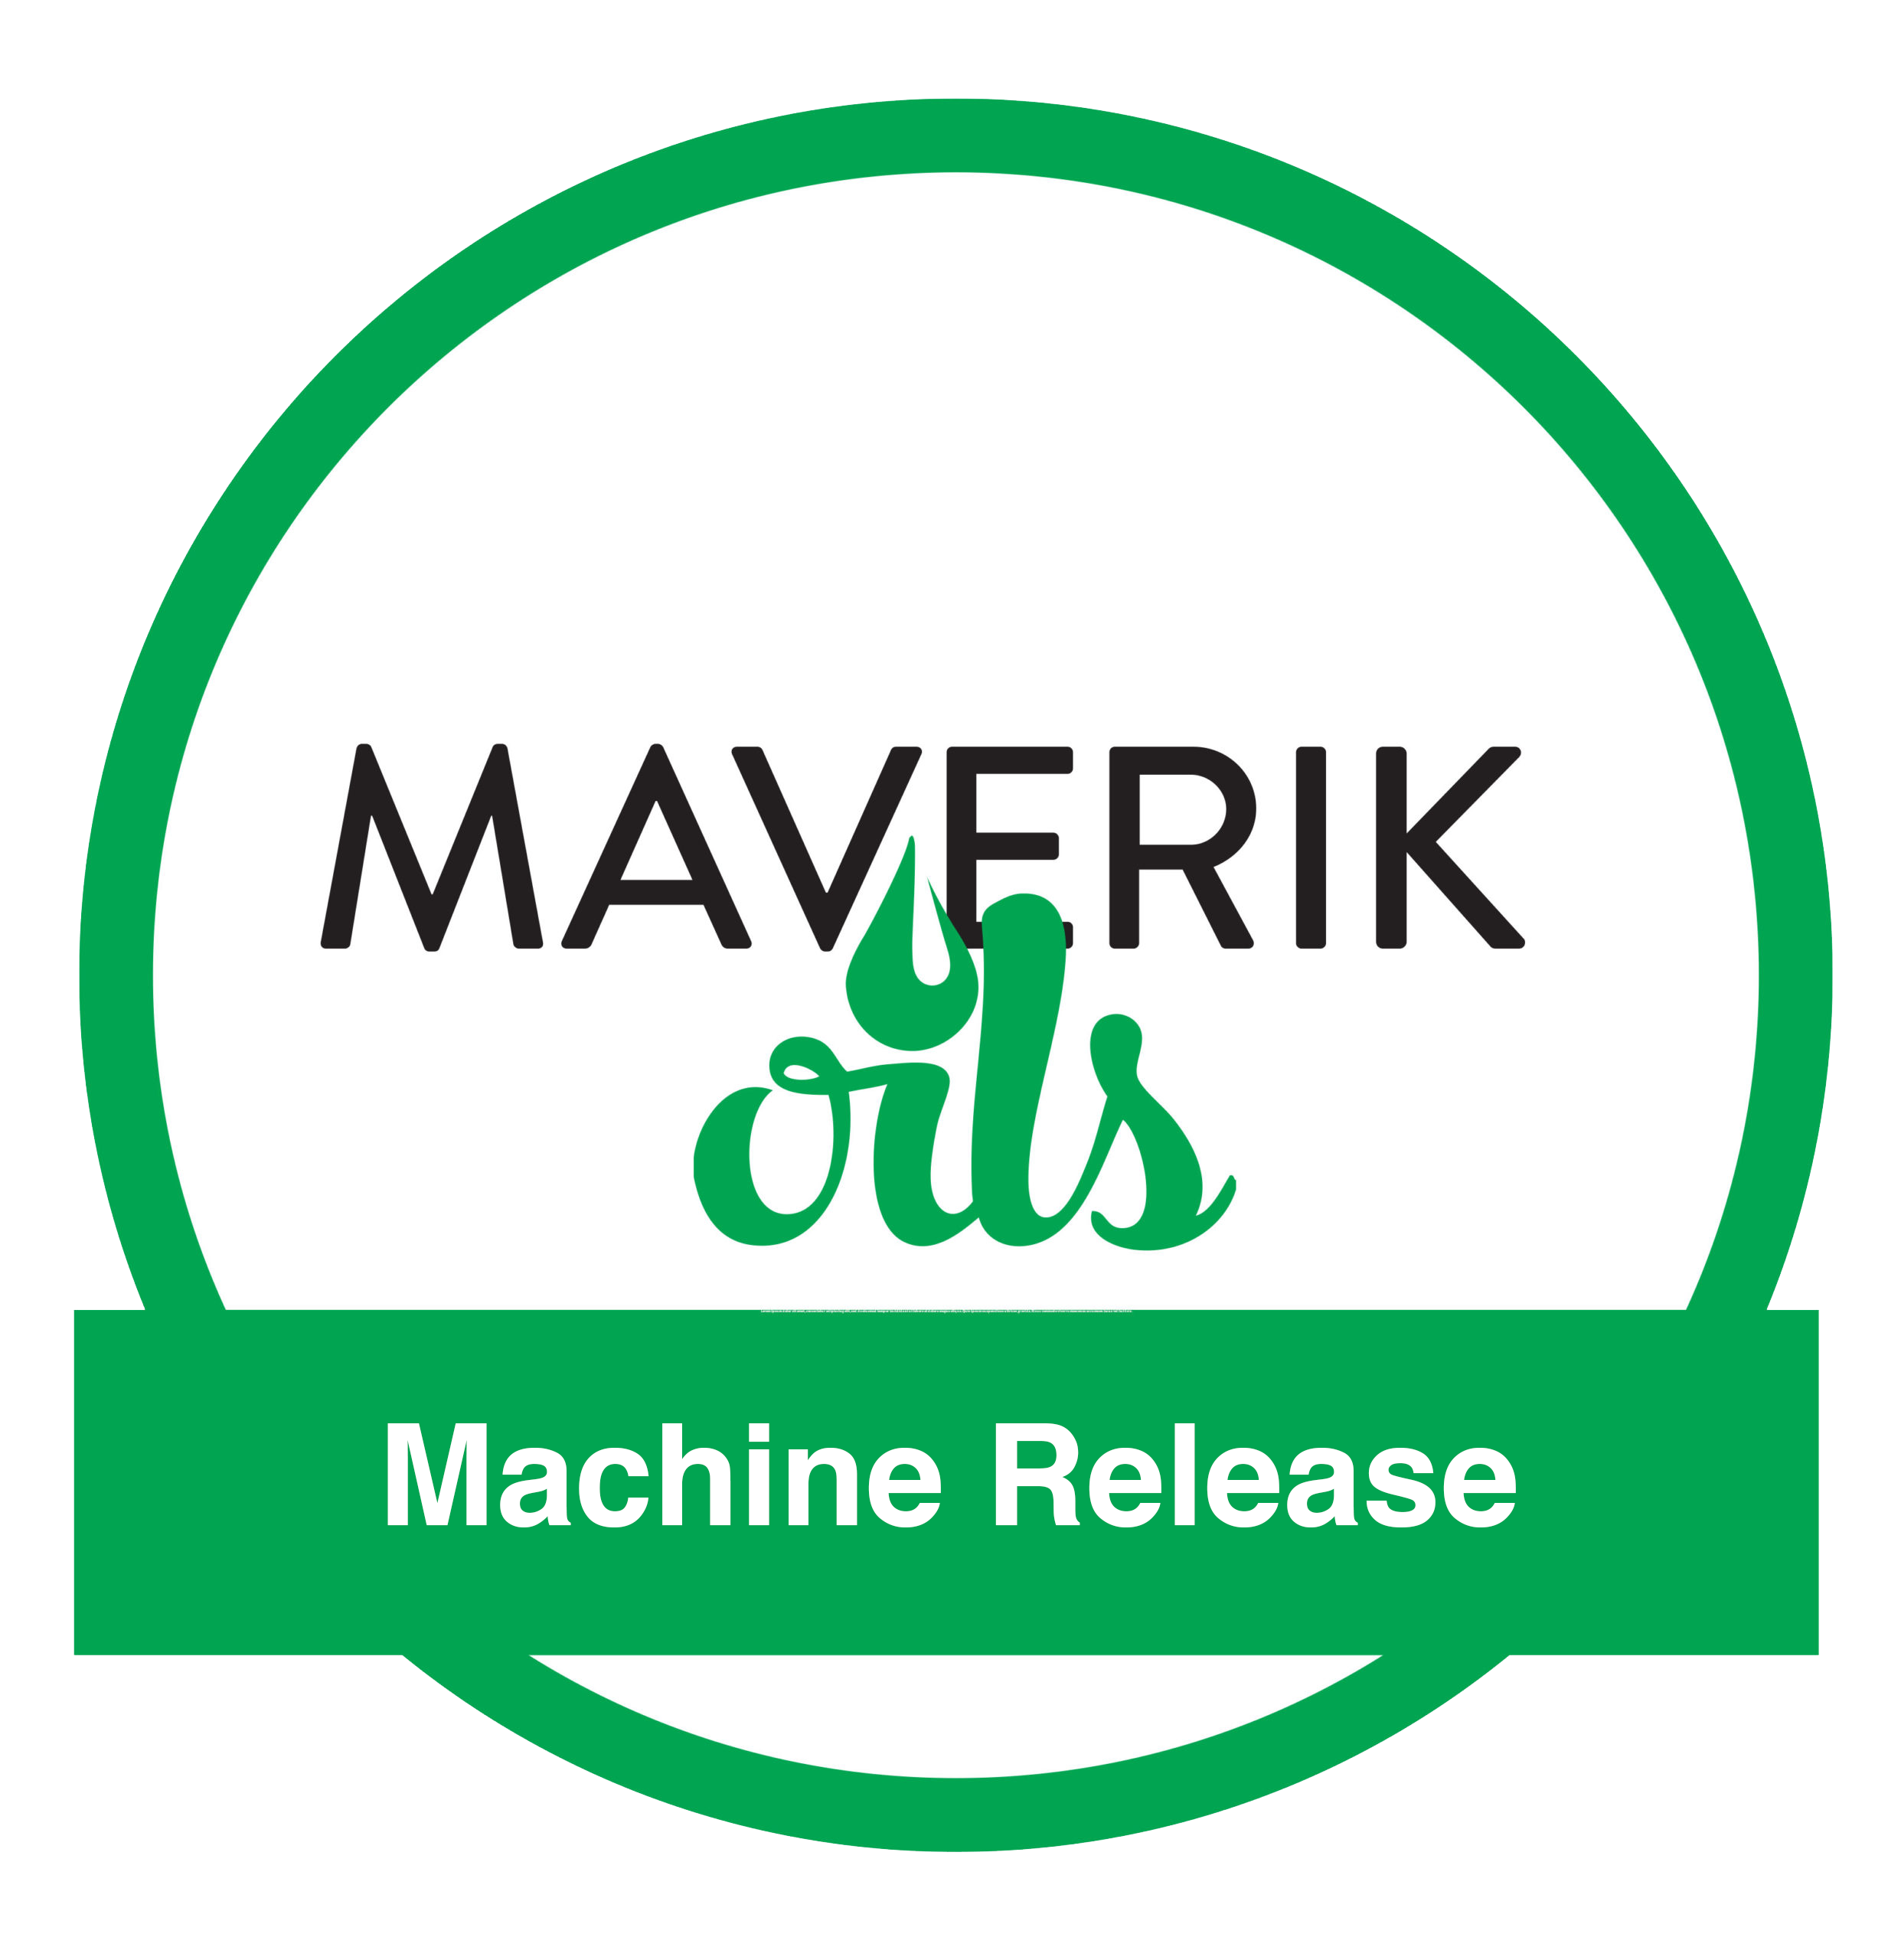 Machine Release